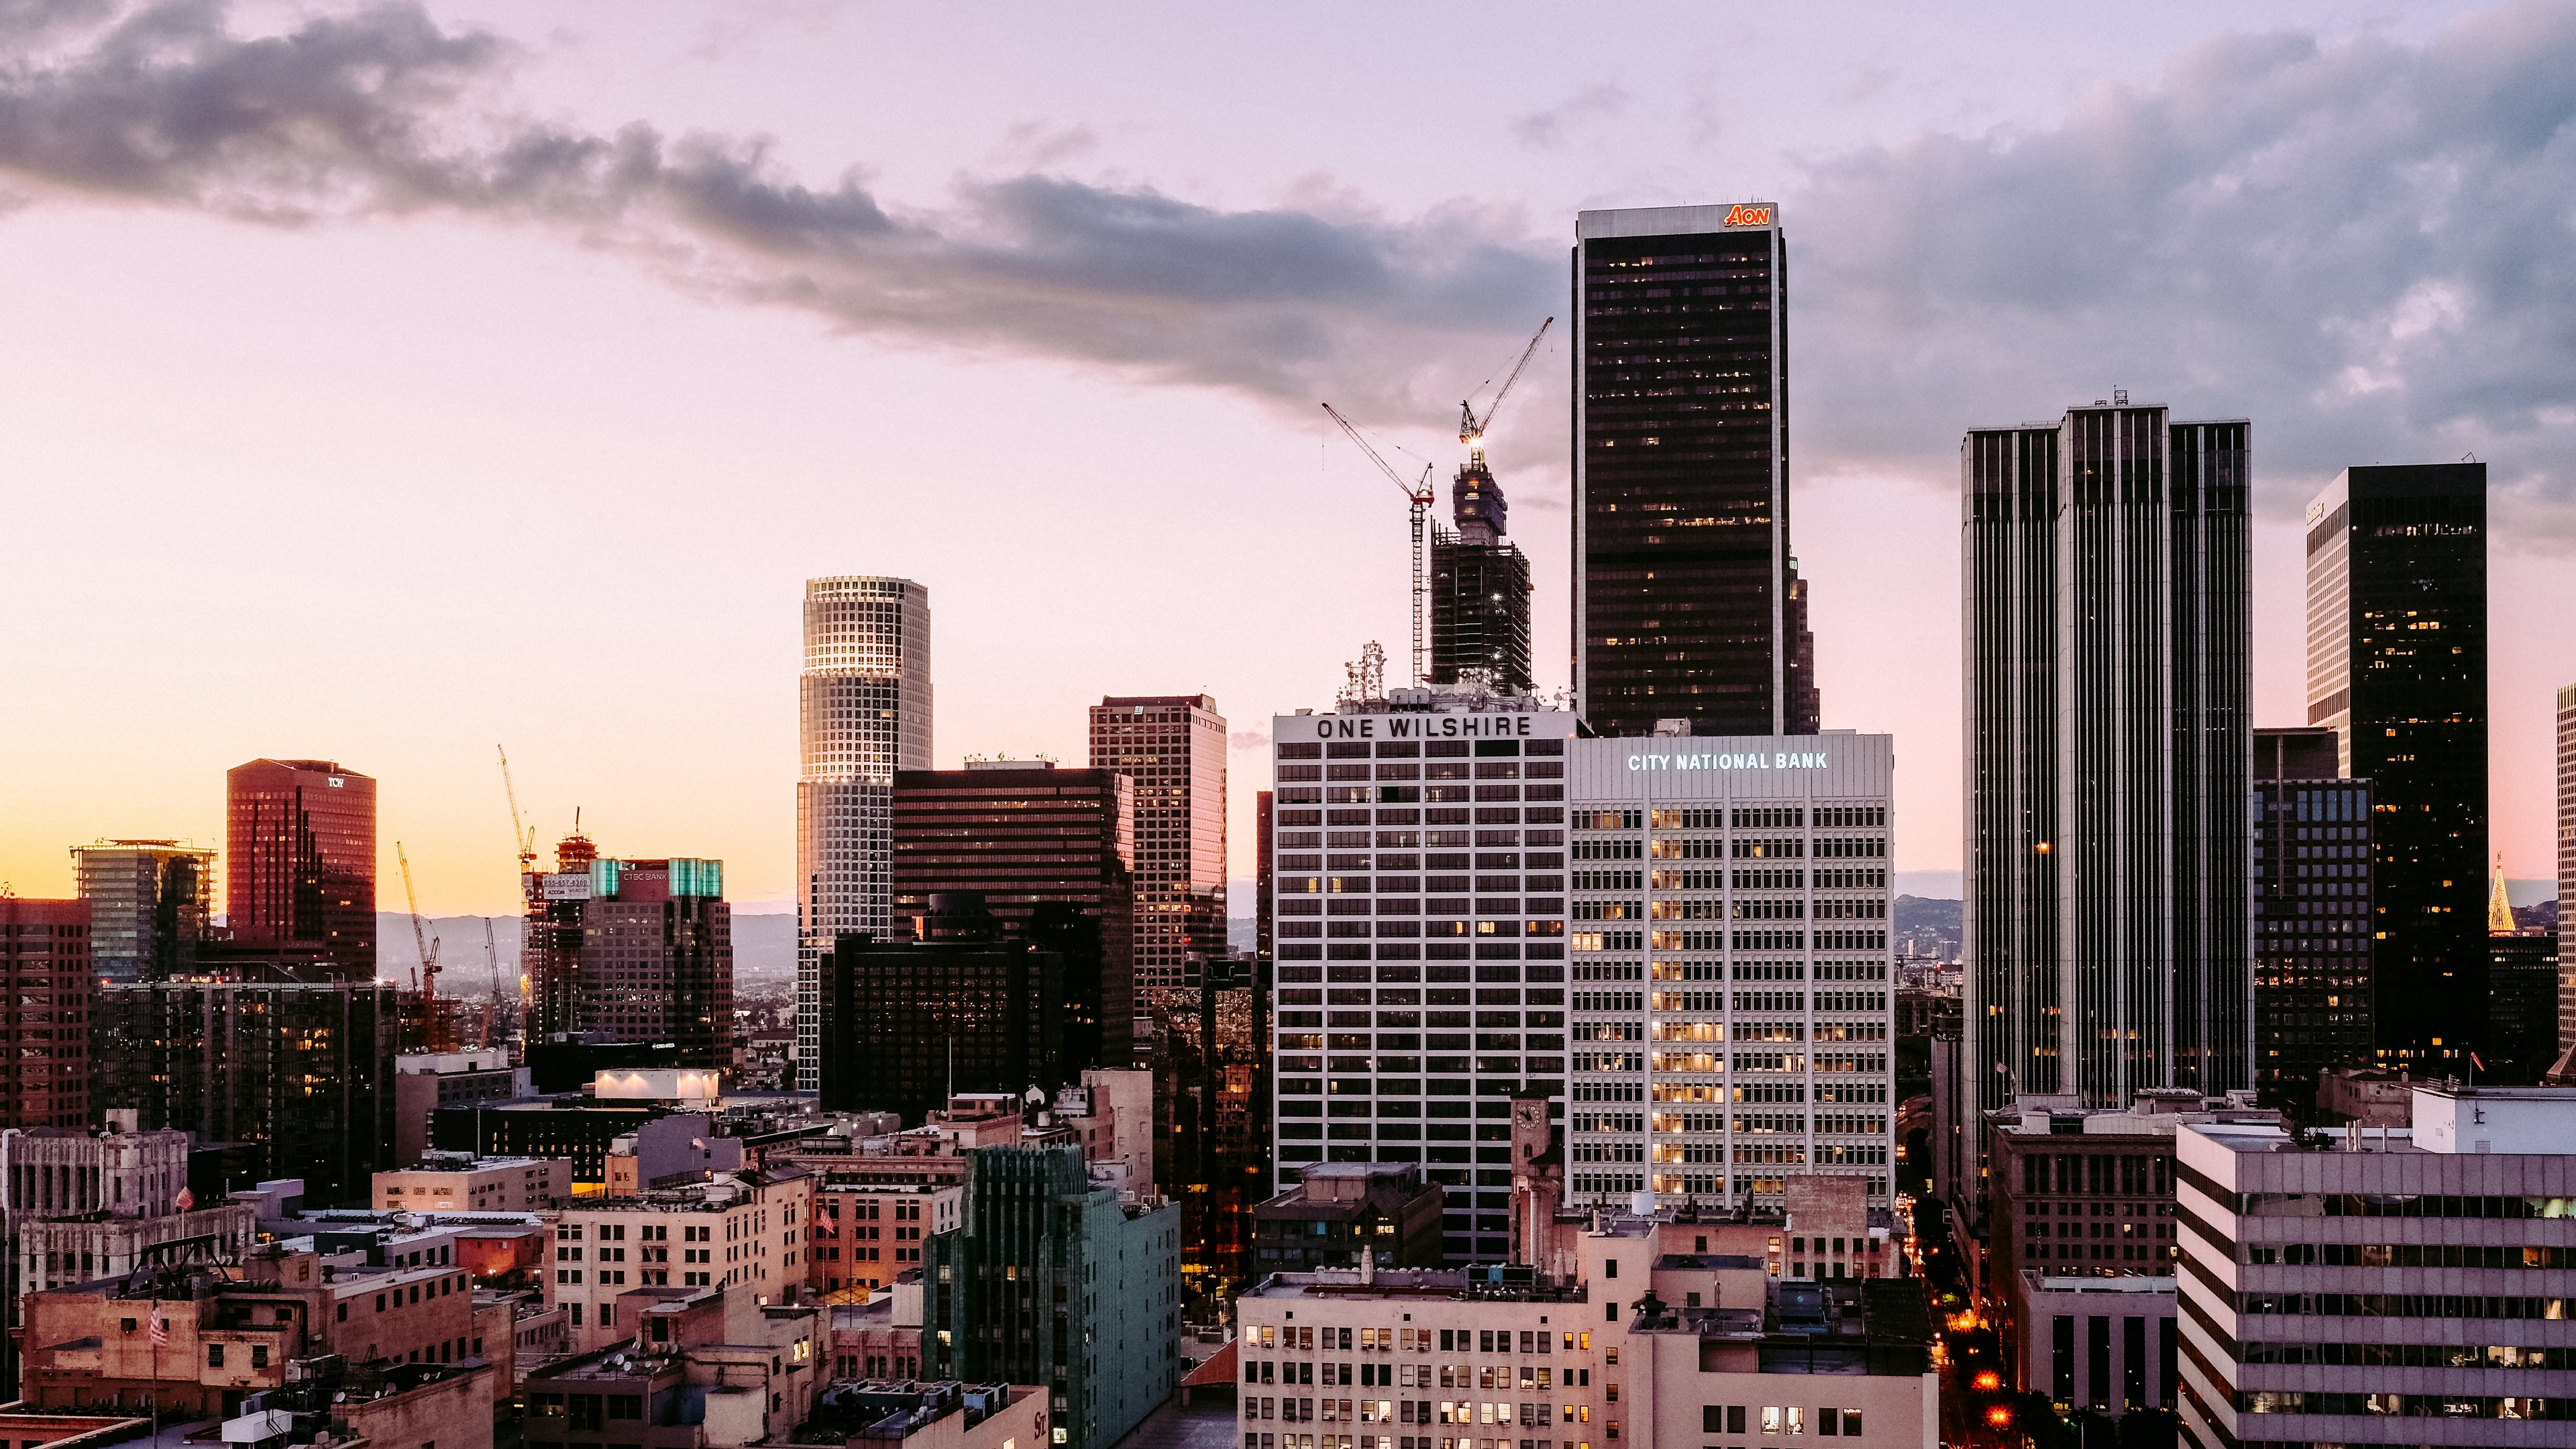 los angeles skyscrapers buildings 4k 1538064833 - los angeles, skyscrapers, buildings 4k - Skyscrapers, los angeles, buildings